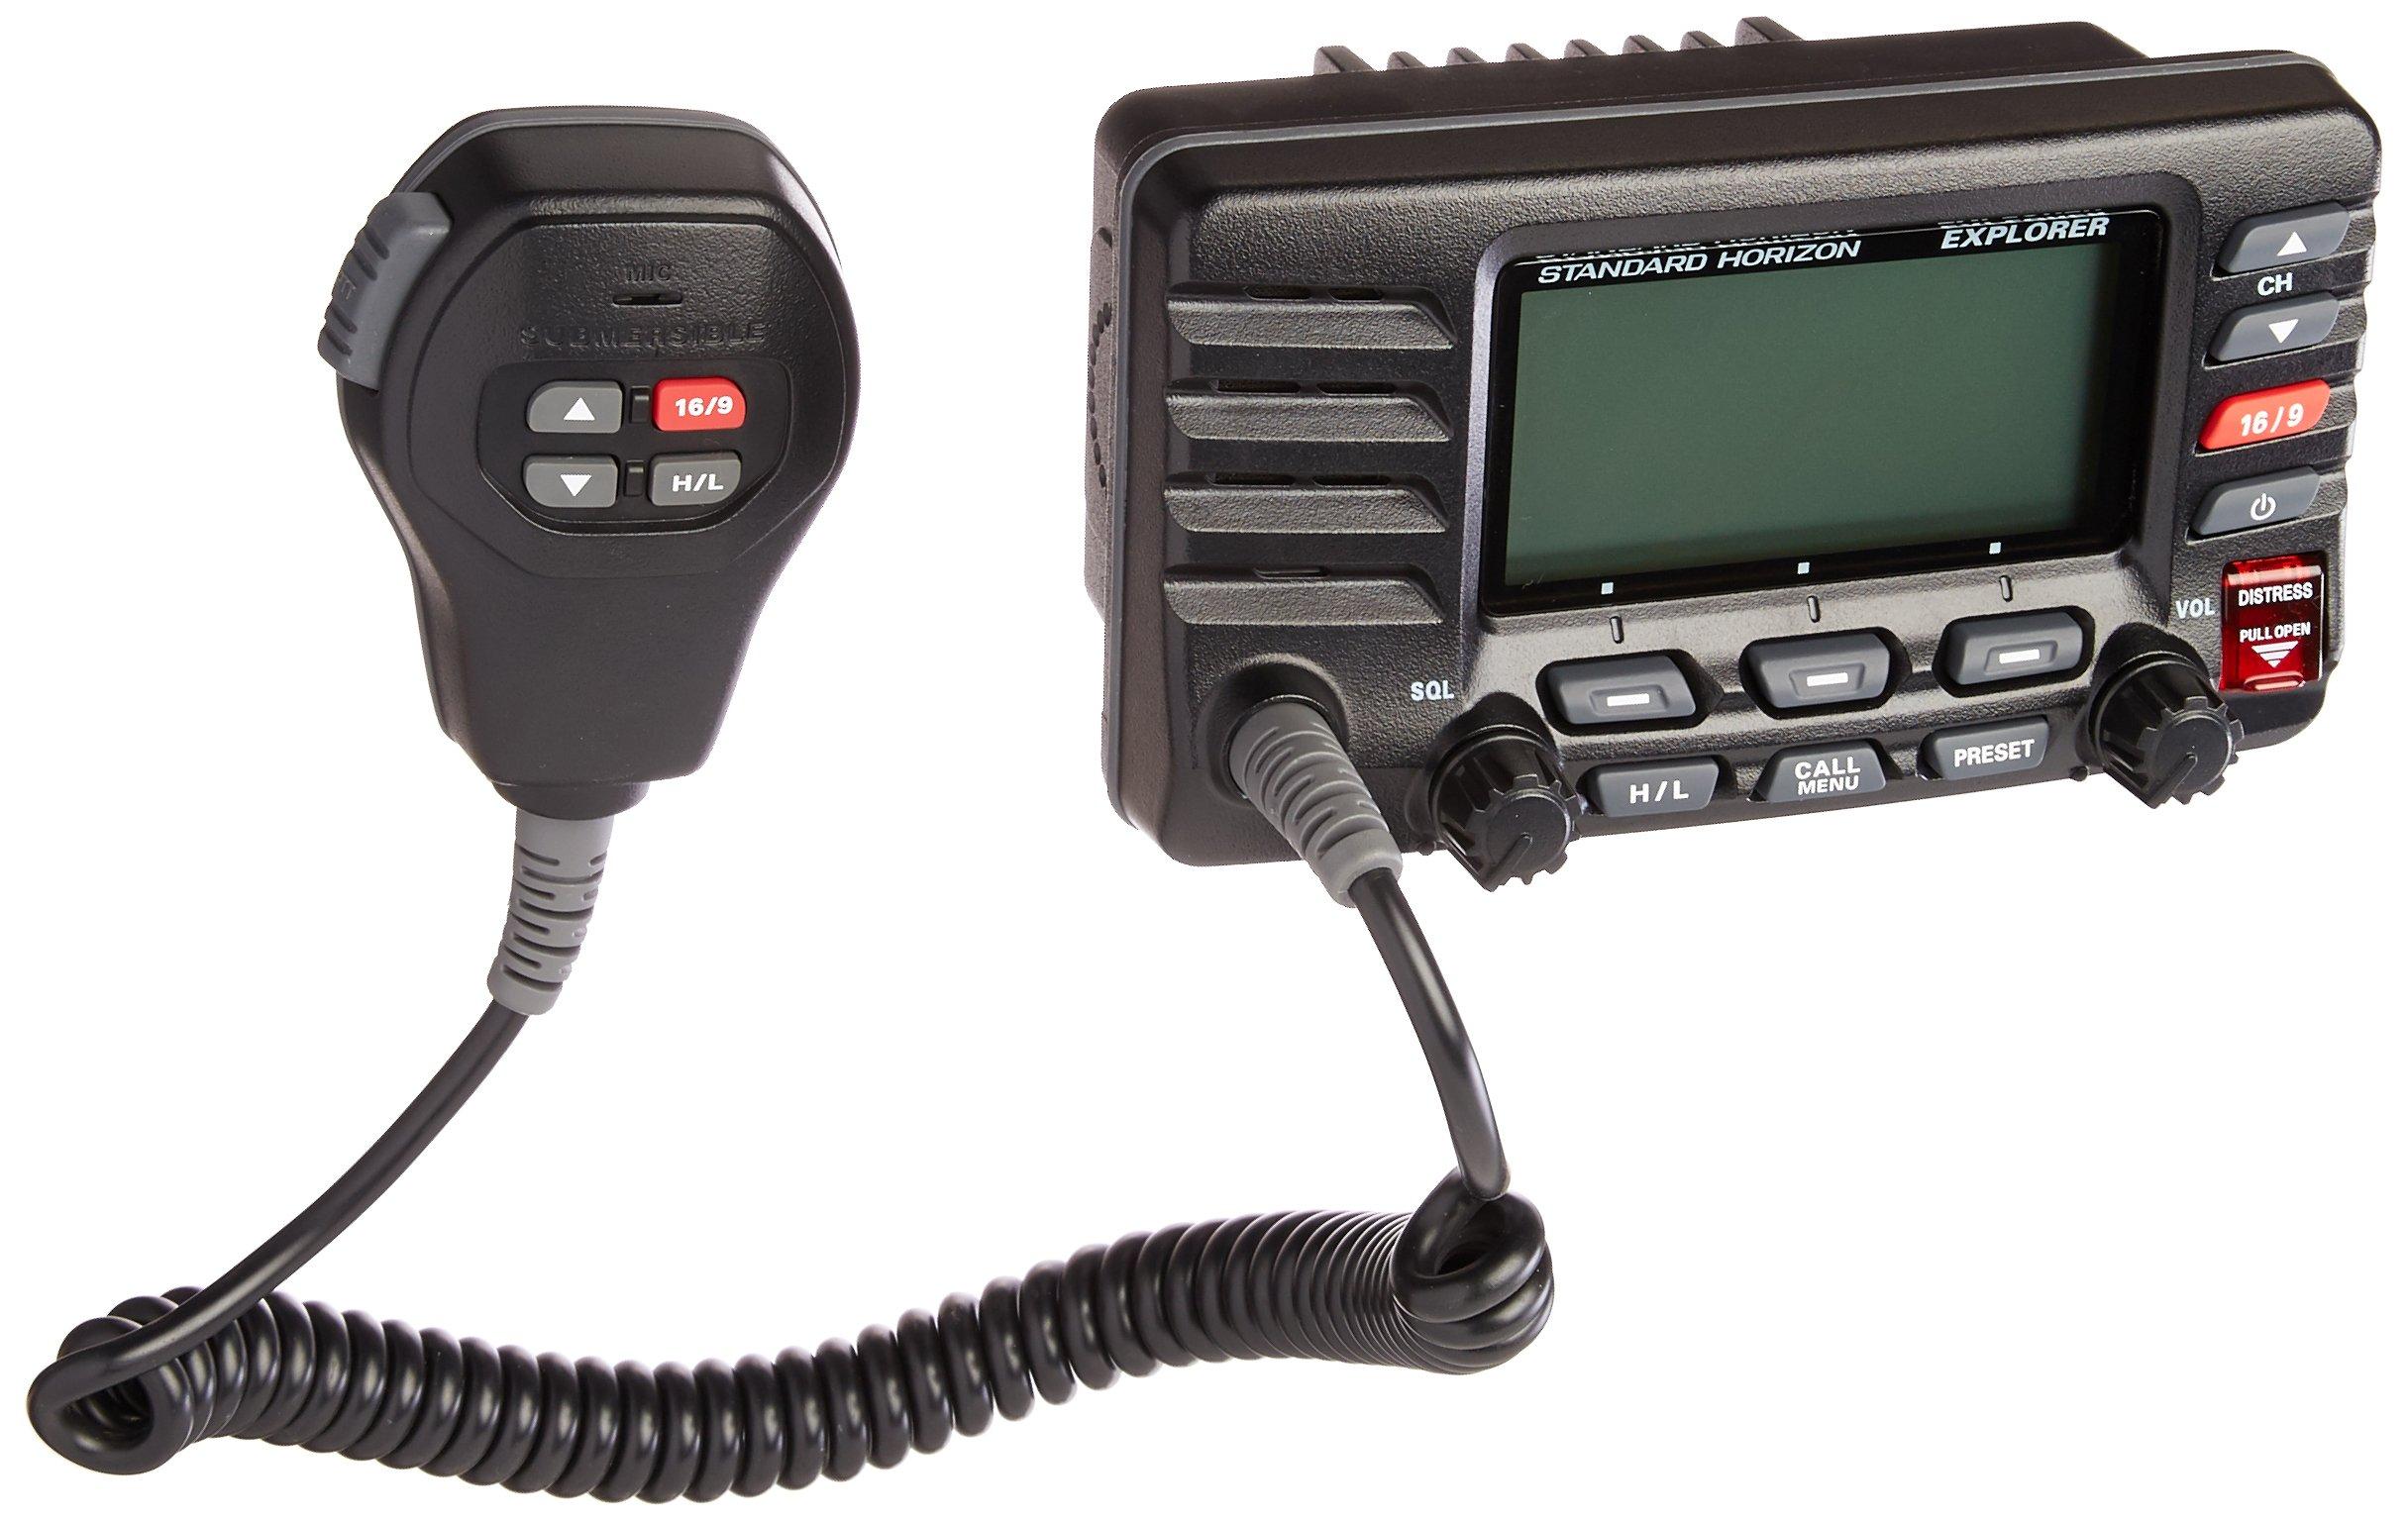 Standard Horizon GX1600B Standard Explorer VHF Marine Radio - Black by STANDARD HORIZON